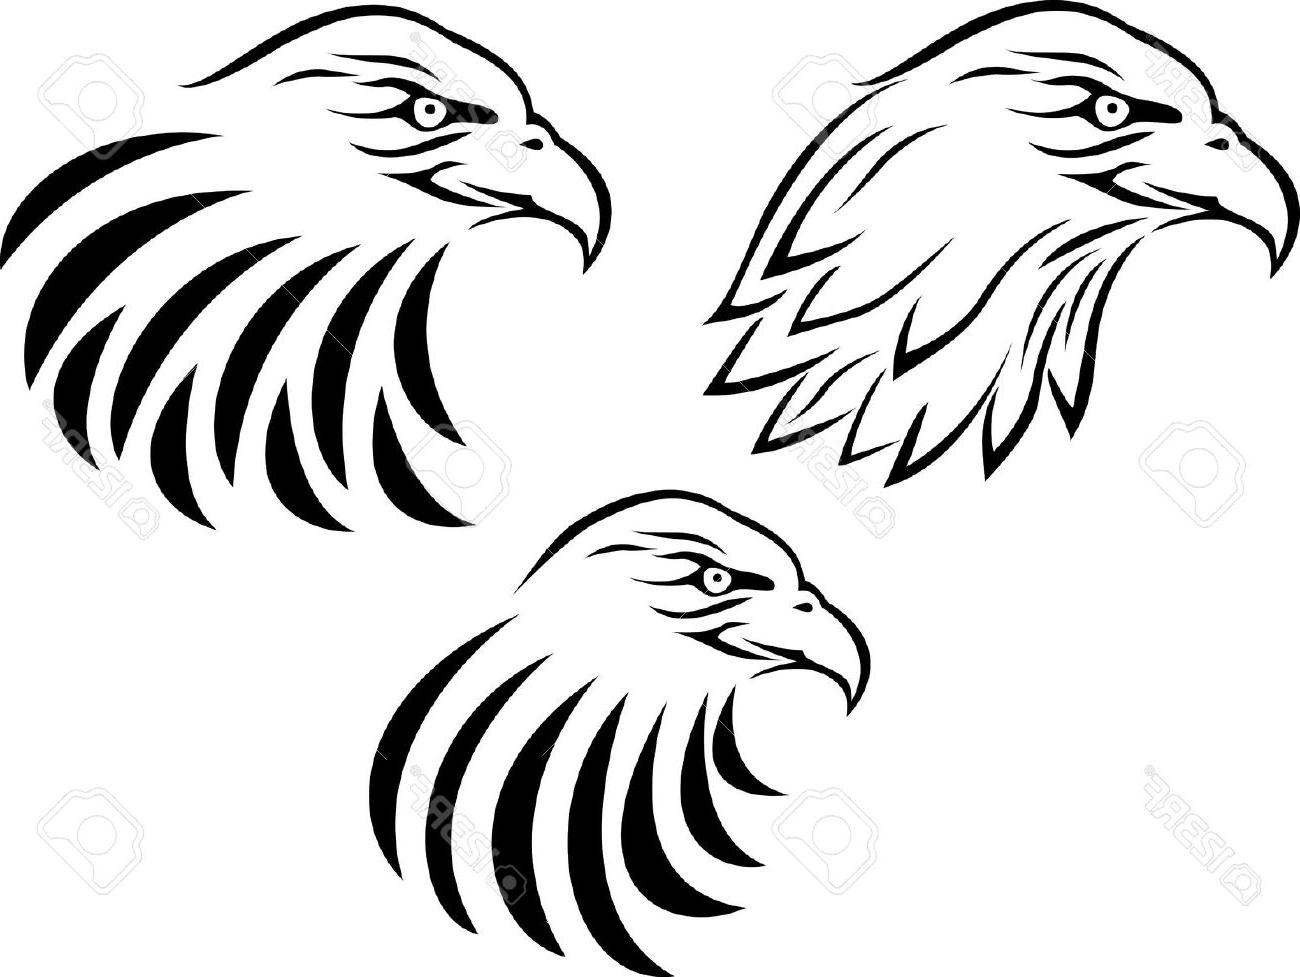 1300x977 Unique Eagle Head Tattoo Stencils Vector Image Free Vector Art